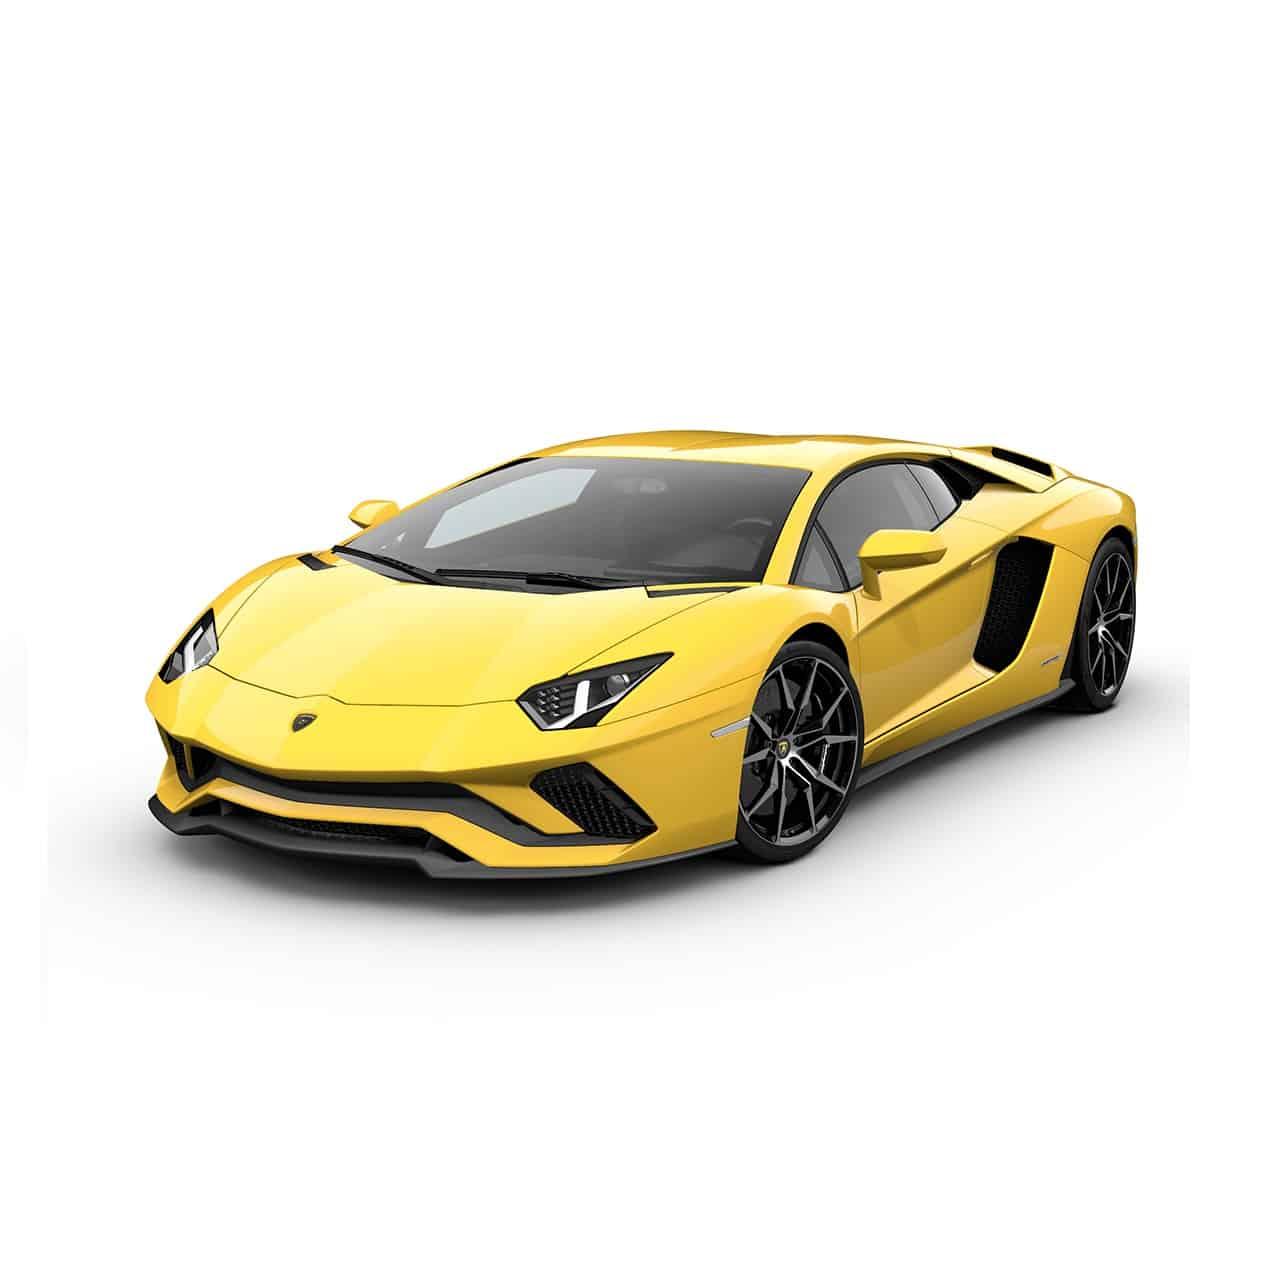 Lamborghini Aventador S Coupe Rent Dubai